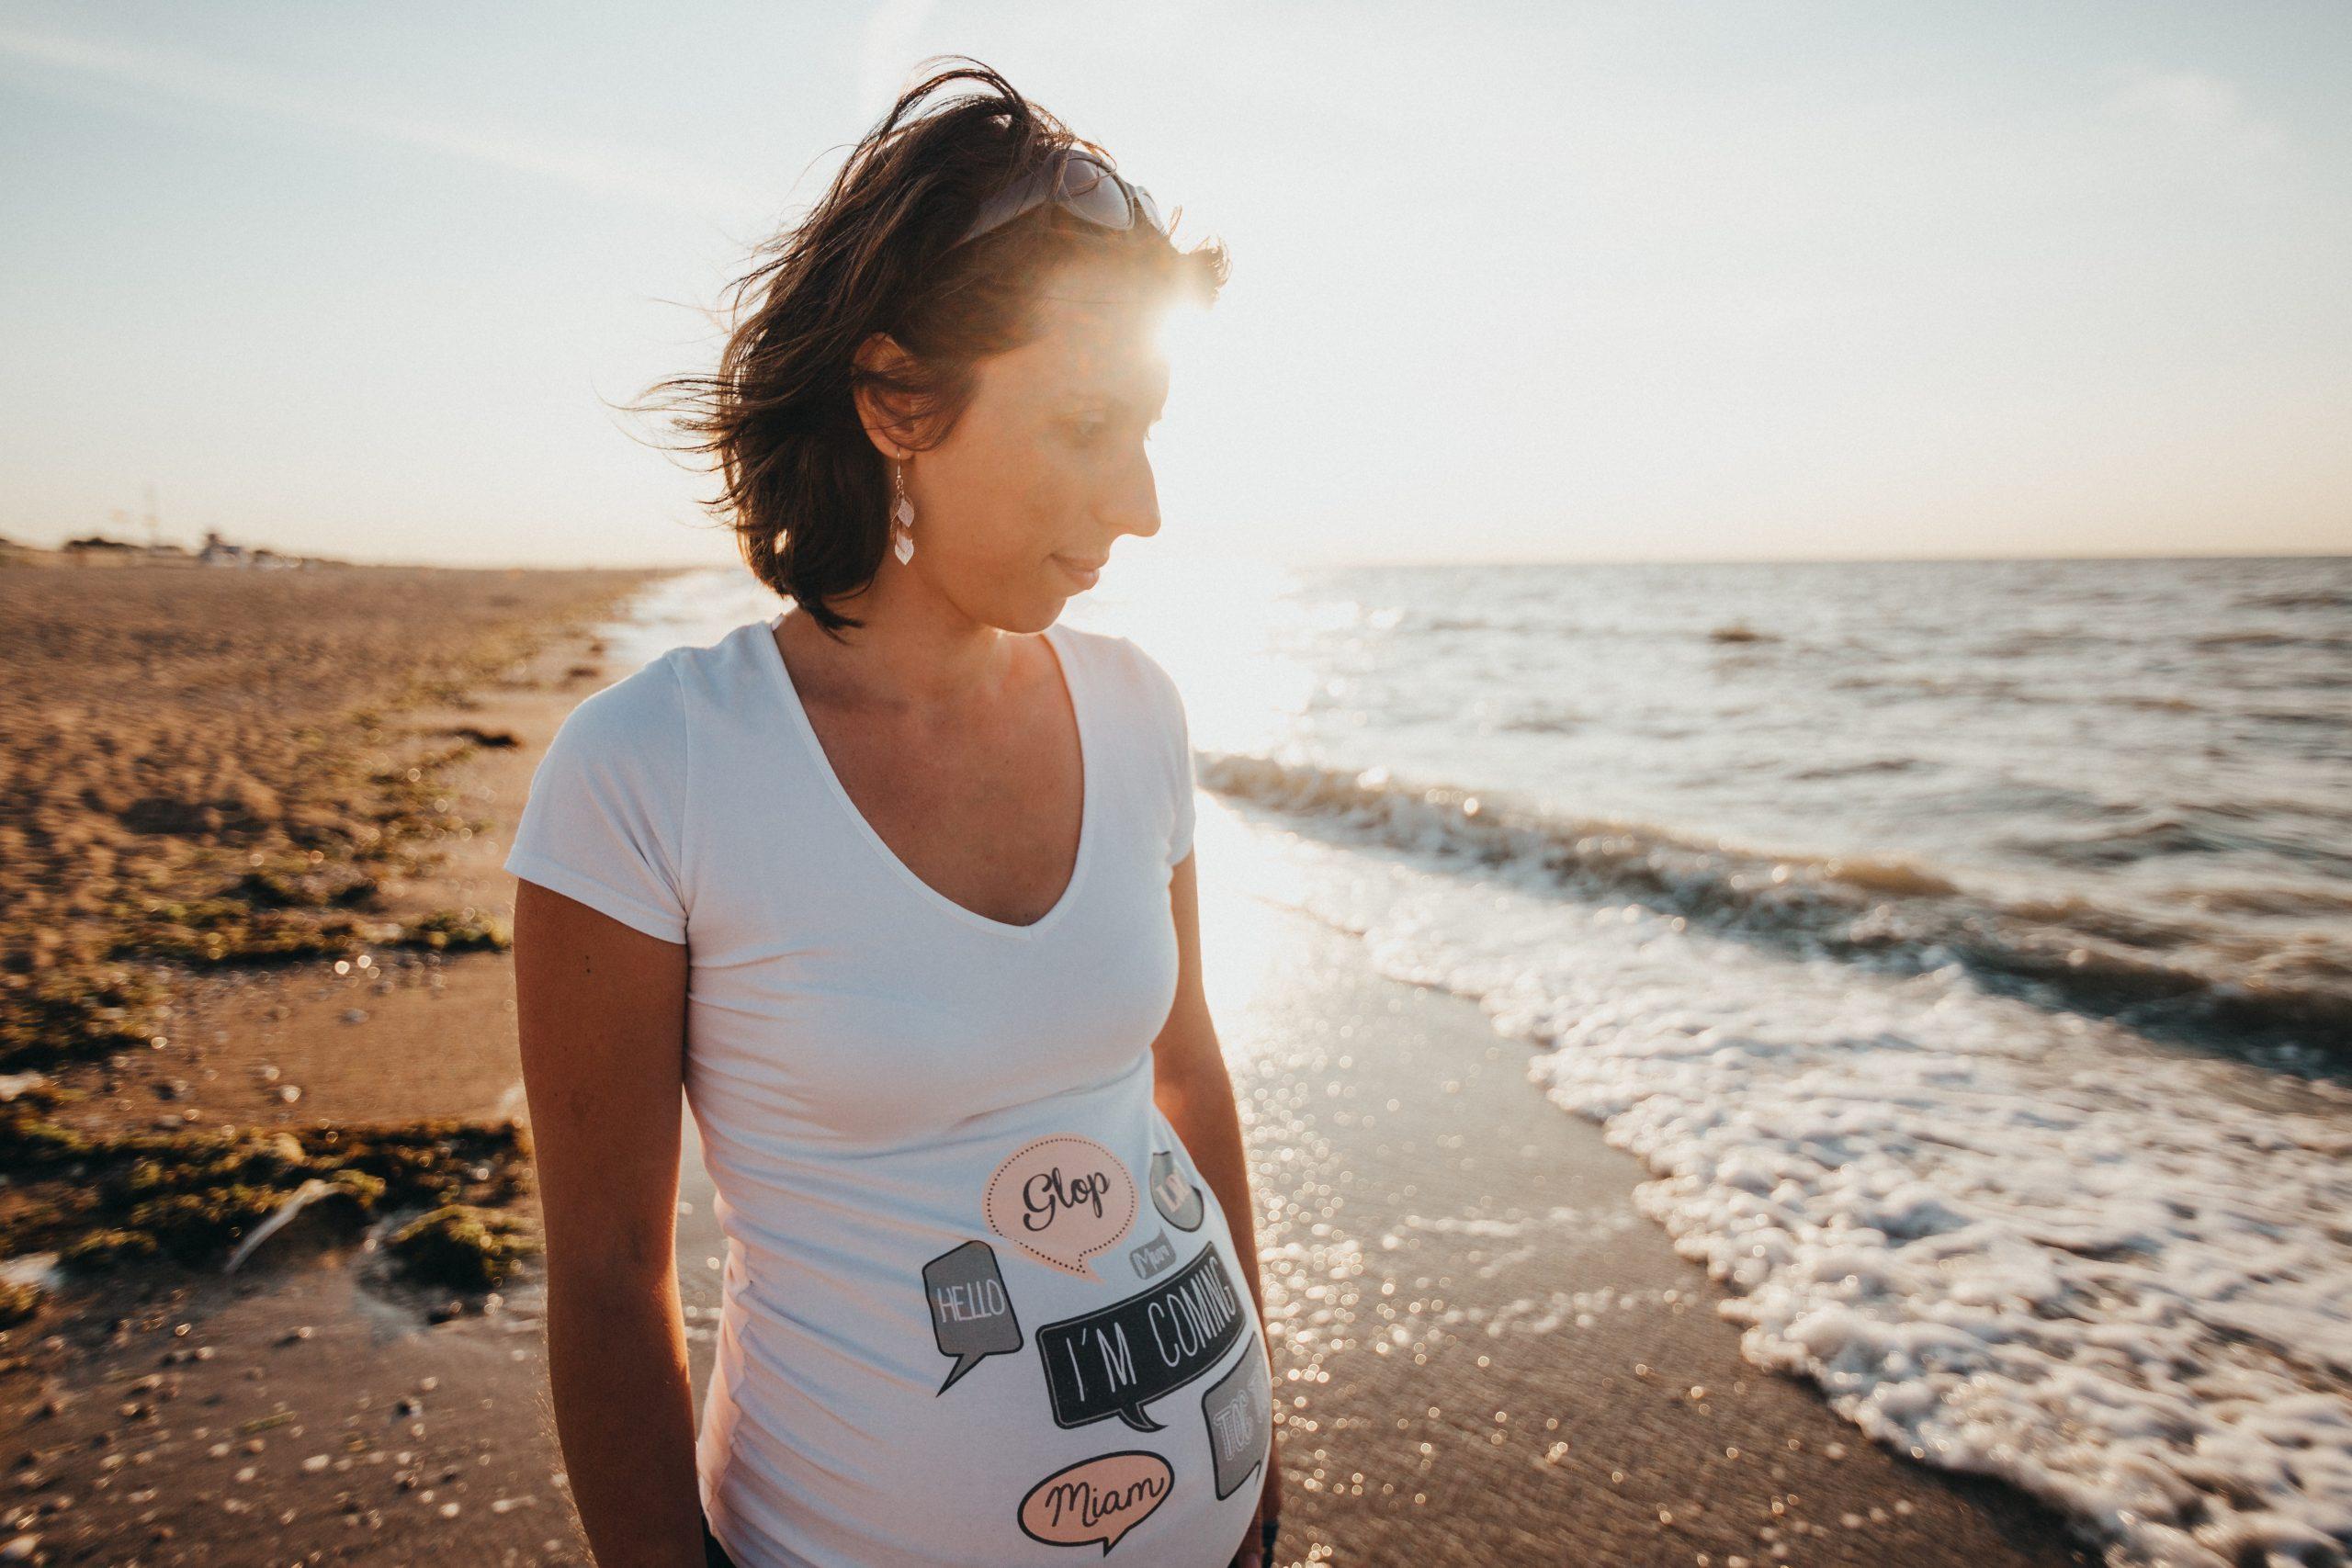 zwangerschapsmasker voorkomen genezen symptomen kenmerken oplossing